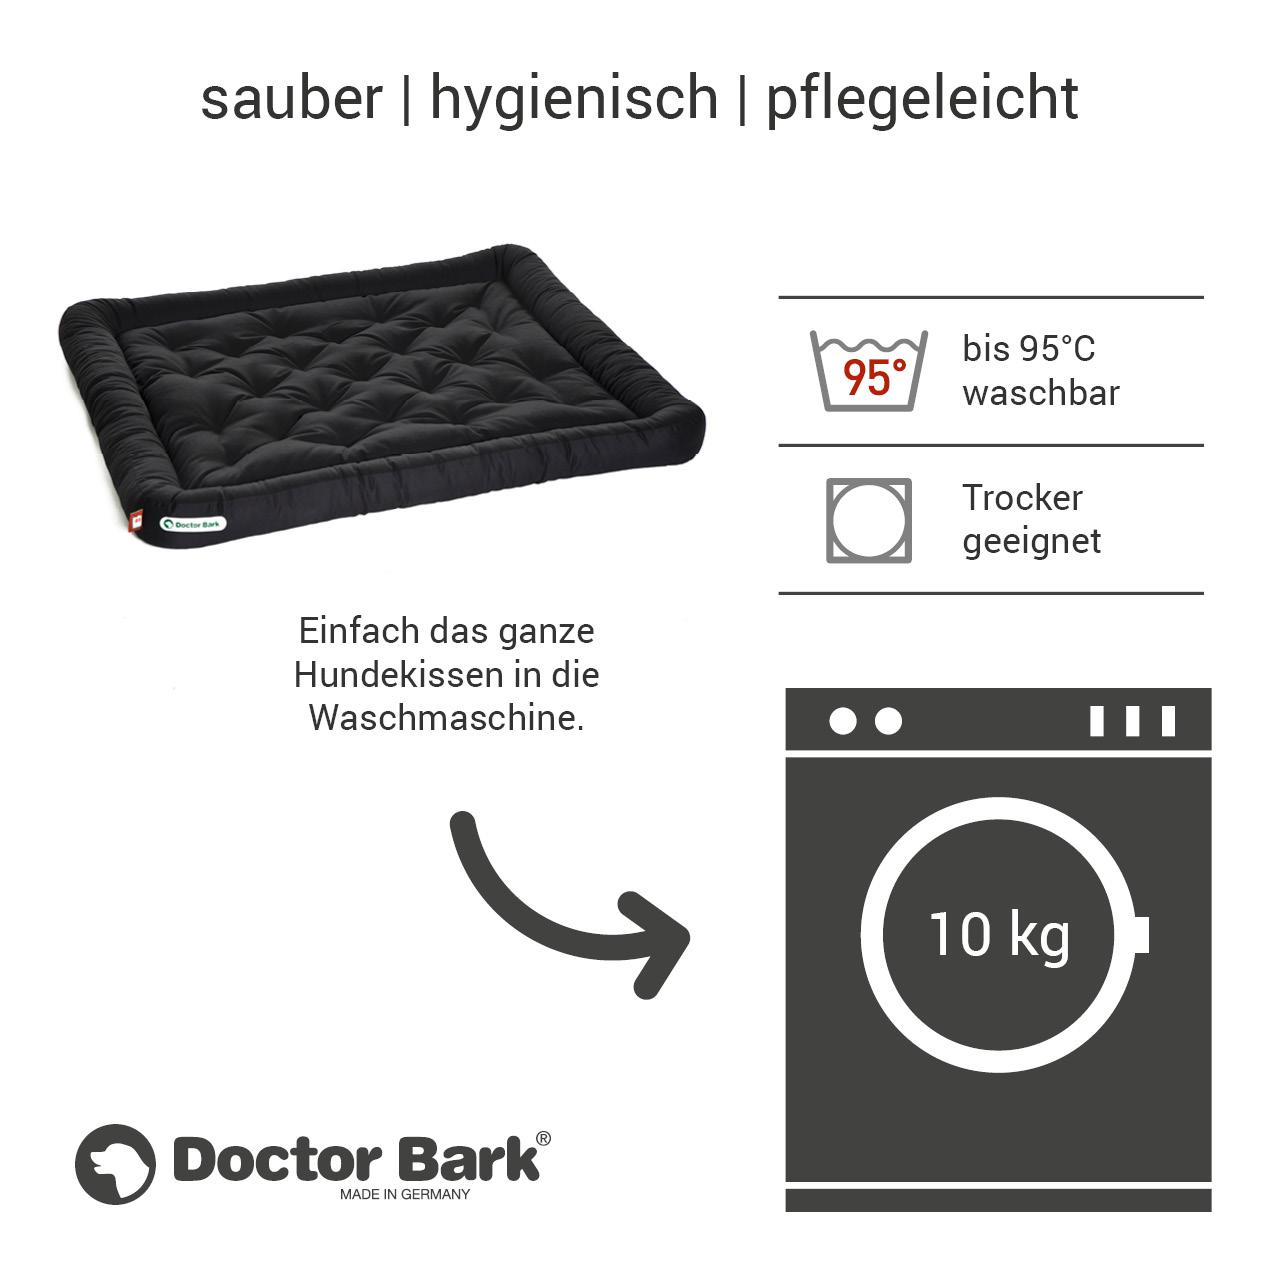 Lounge-Hundekissen / Hundebett orthopädisch Doctor Bark waschbar schwarz - Gr. XXL